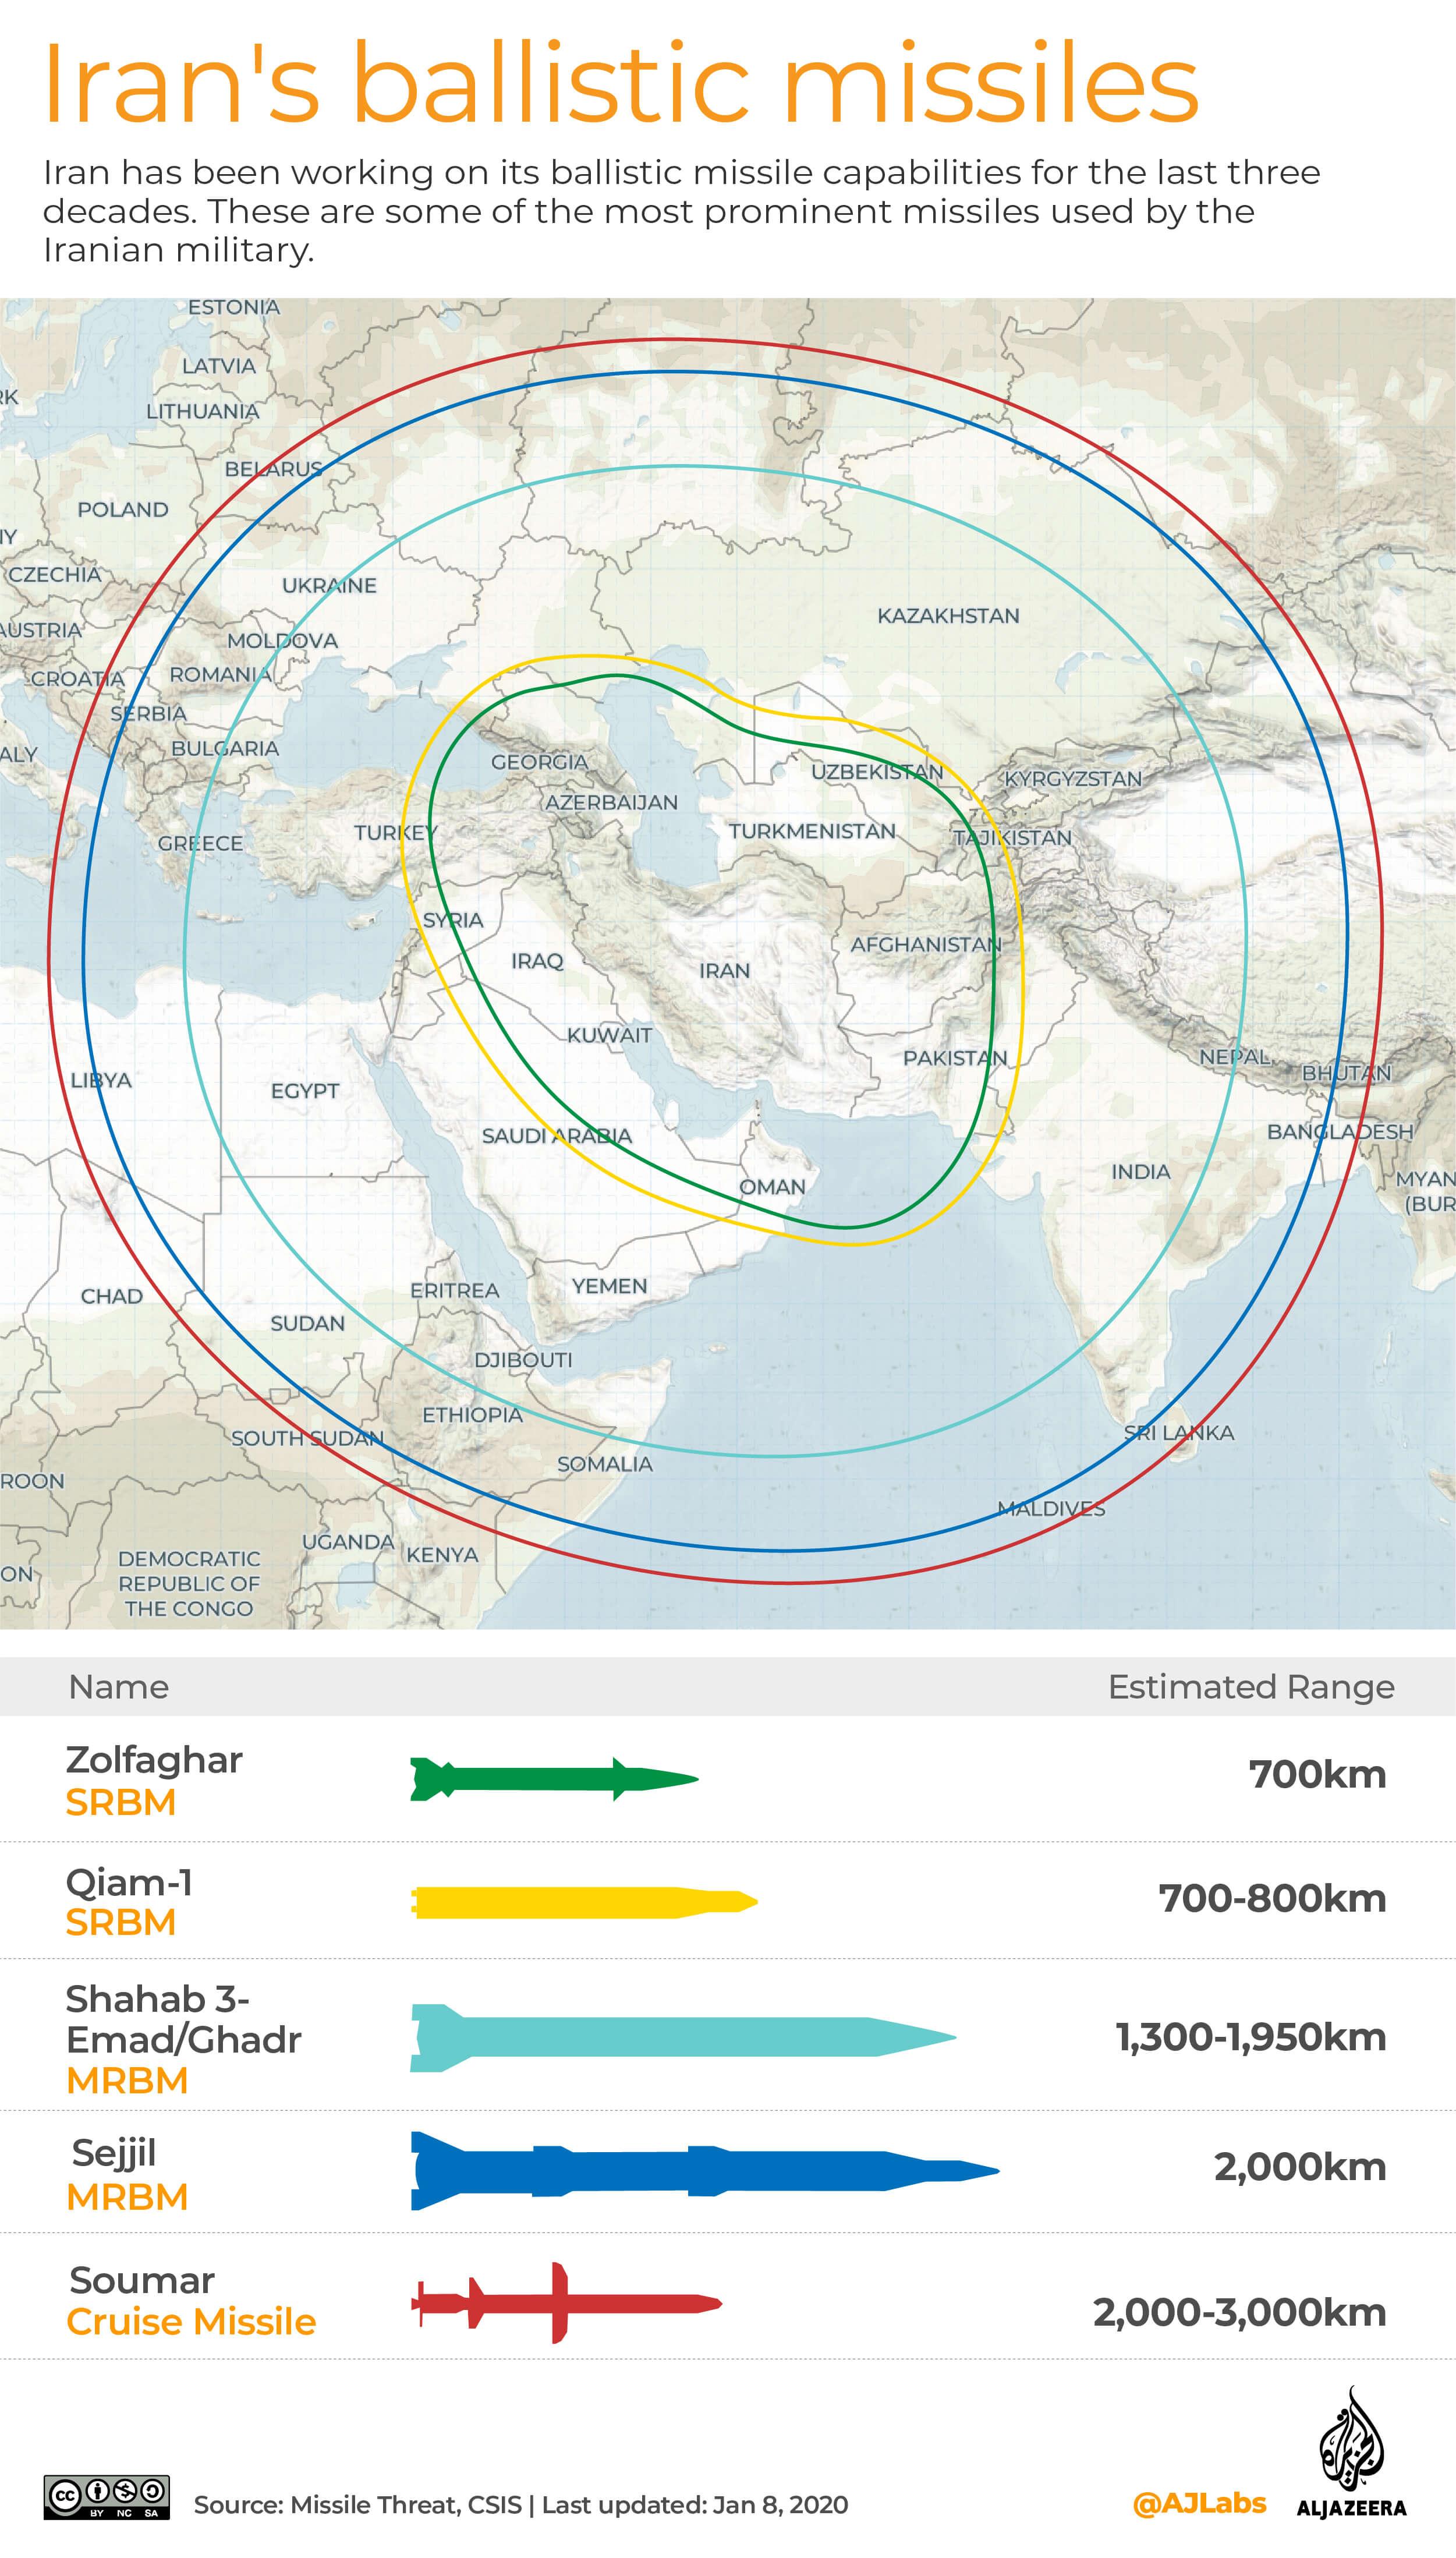 INTERACTIVE: Iran ballistic missiles 2020